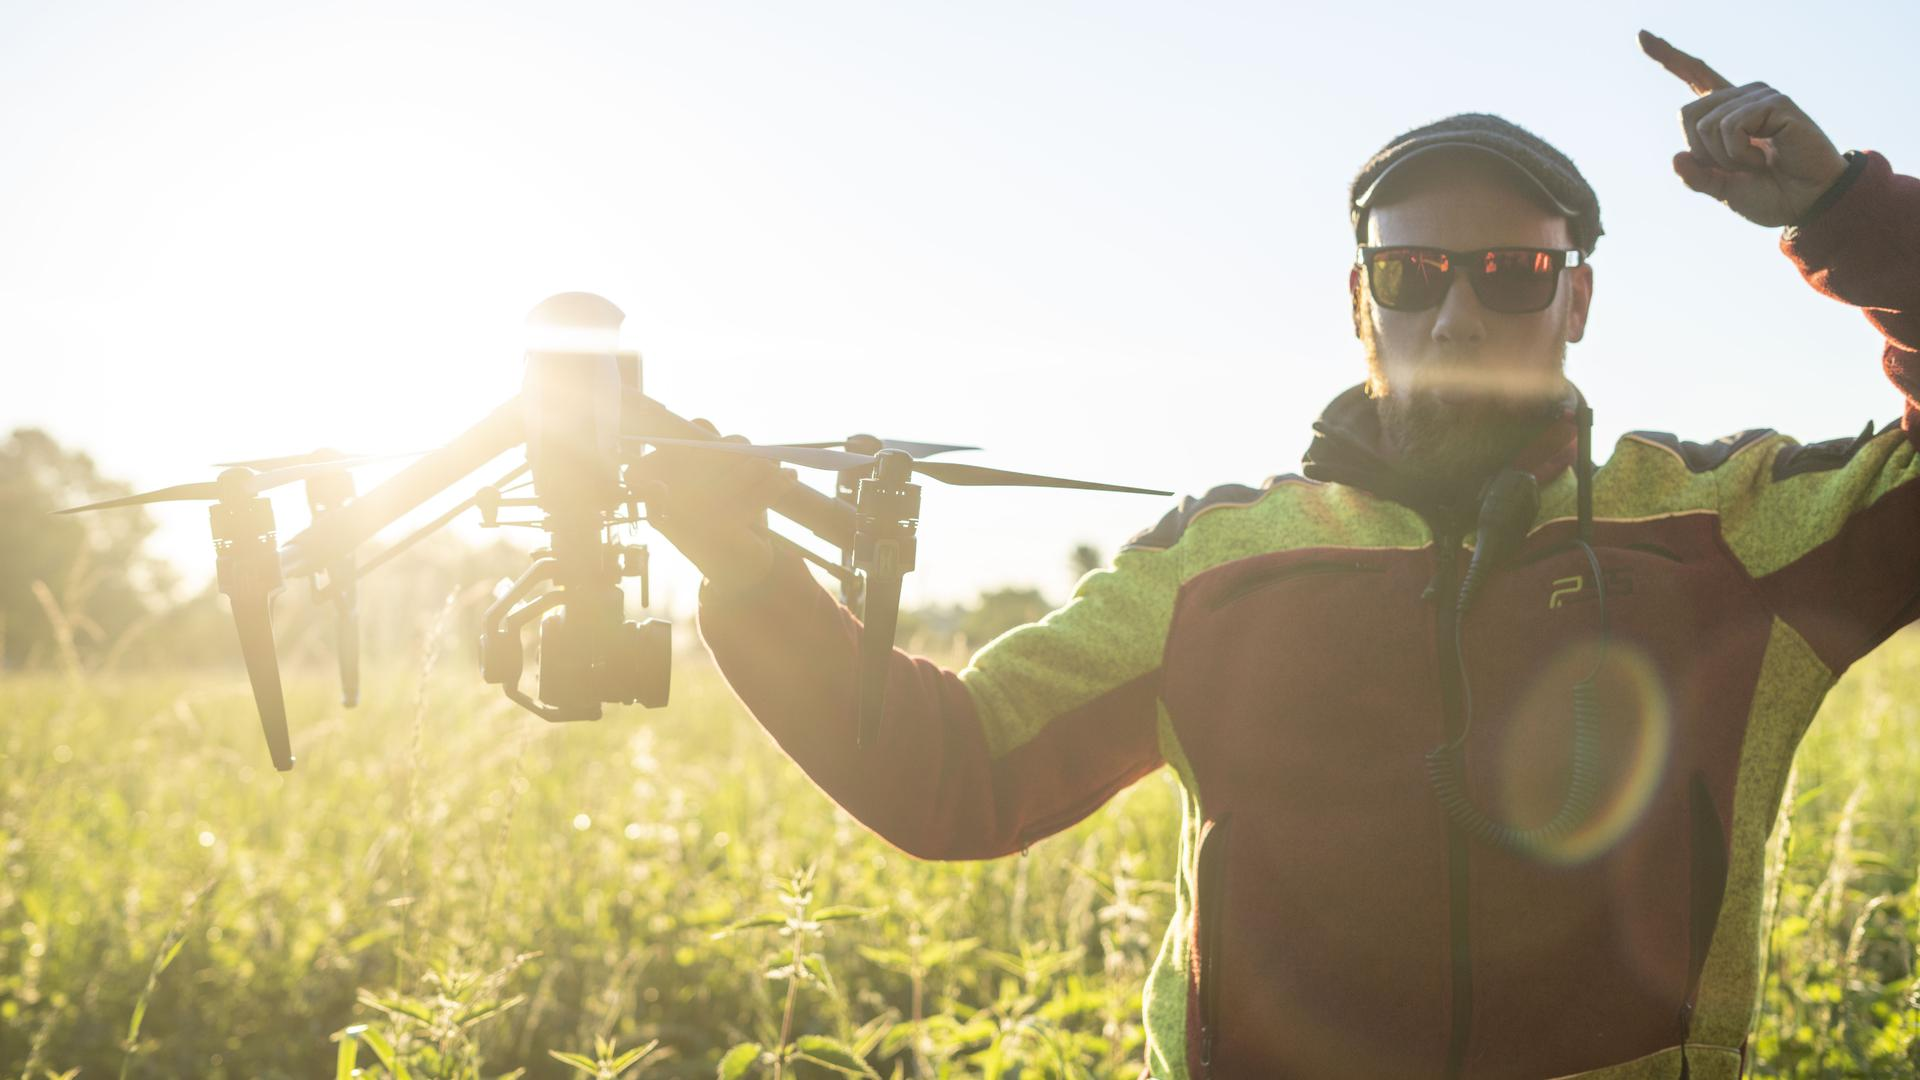 Mann hält eine Drohne